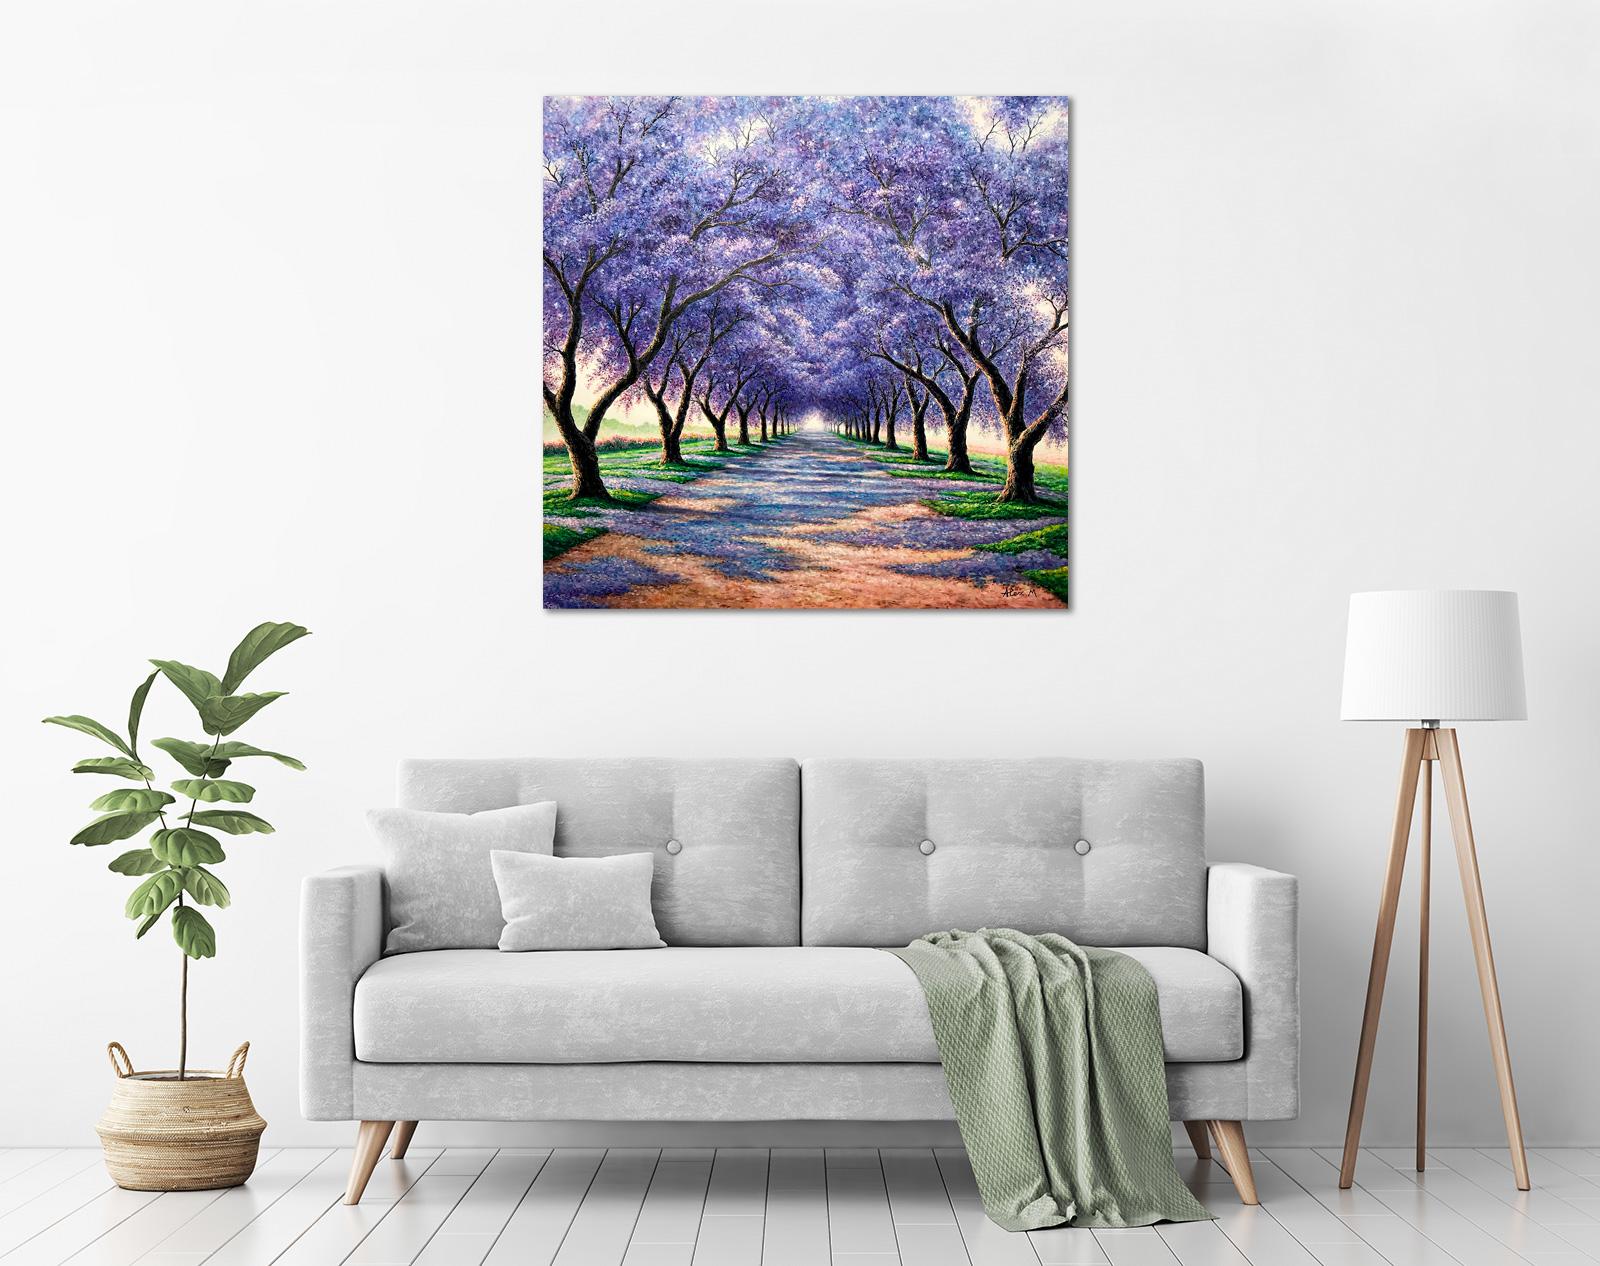 Alex Mo - 'Jacaranda Flowers' in a room